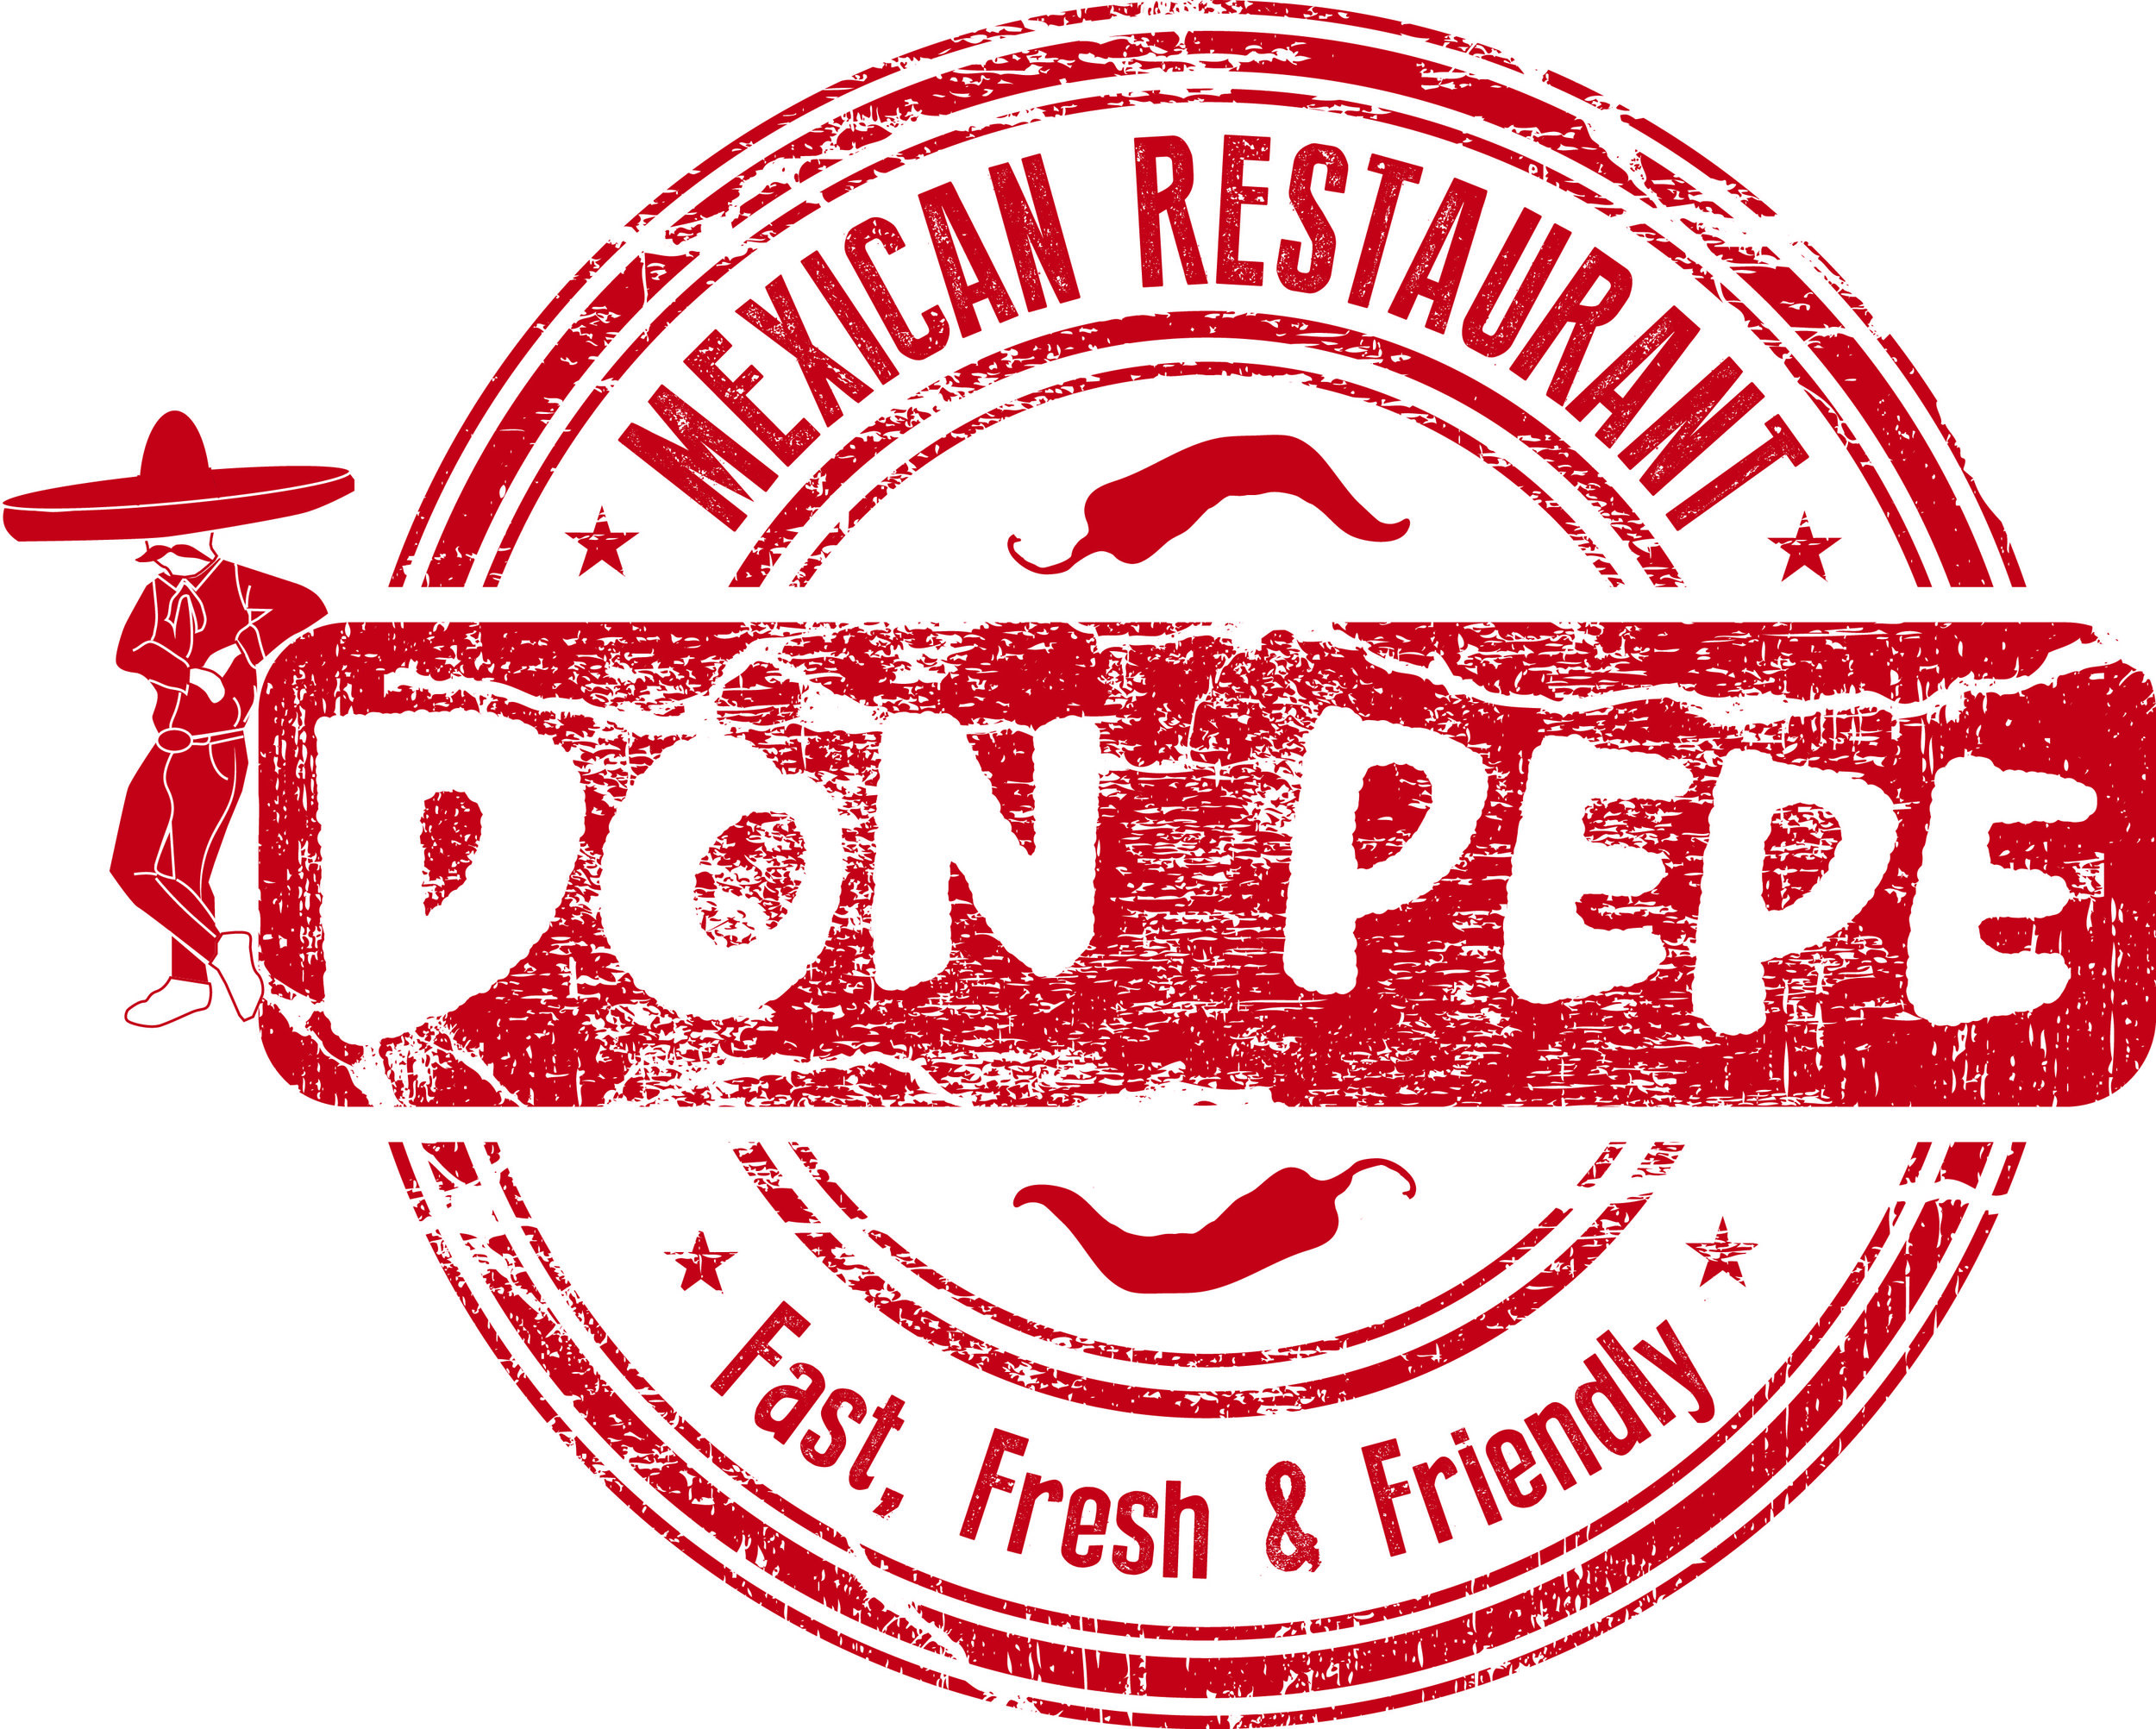 Mr. Pepe Mexican Restaurant     Mauricio Sandoval 804-768-2260  10902 Hull Street Road  Midlothian, VA 23112  ———— 2102 W Hundred Rd Chester, VA 23836